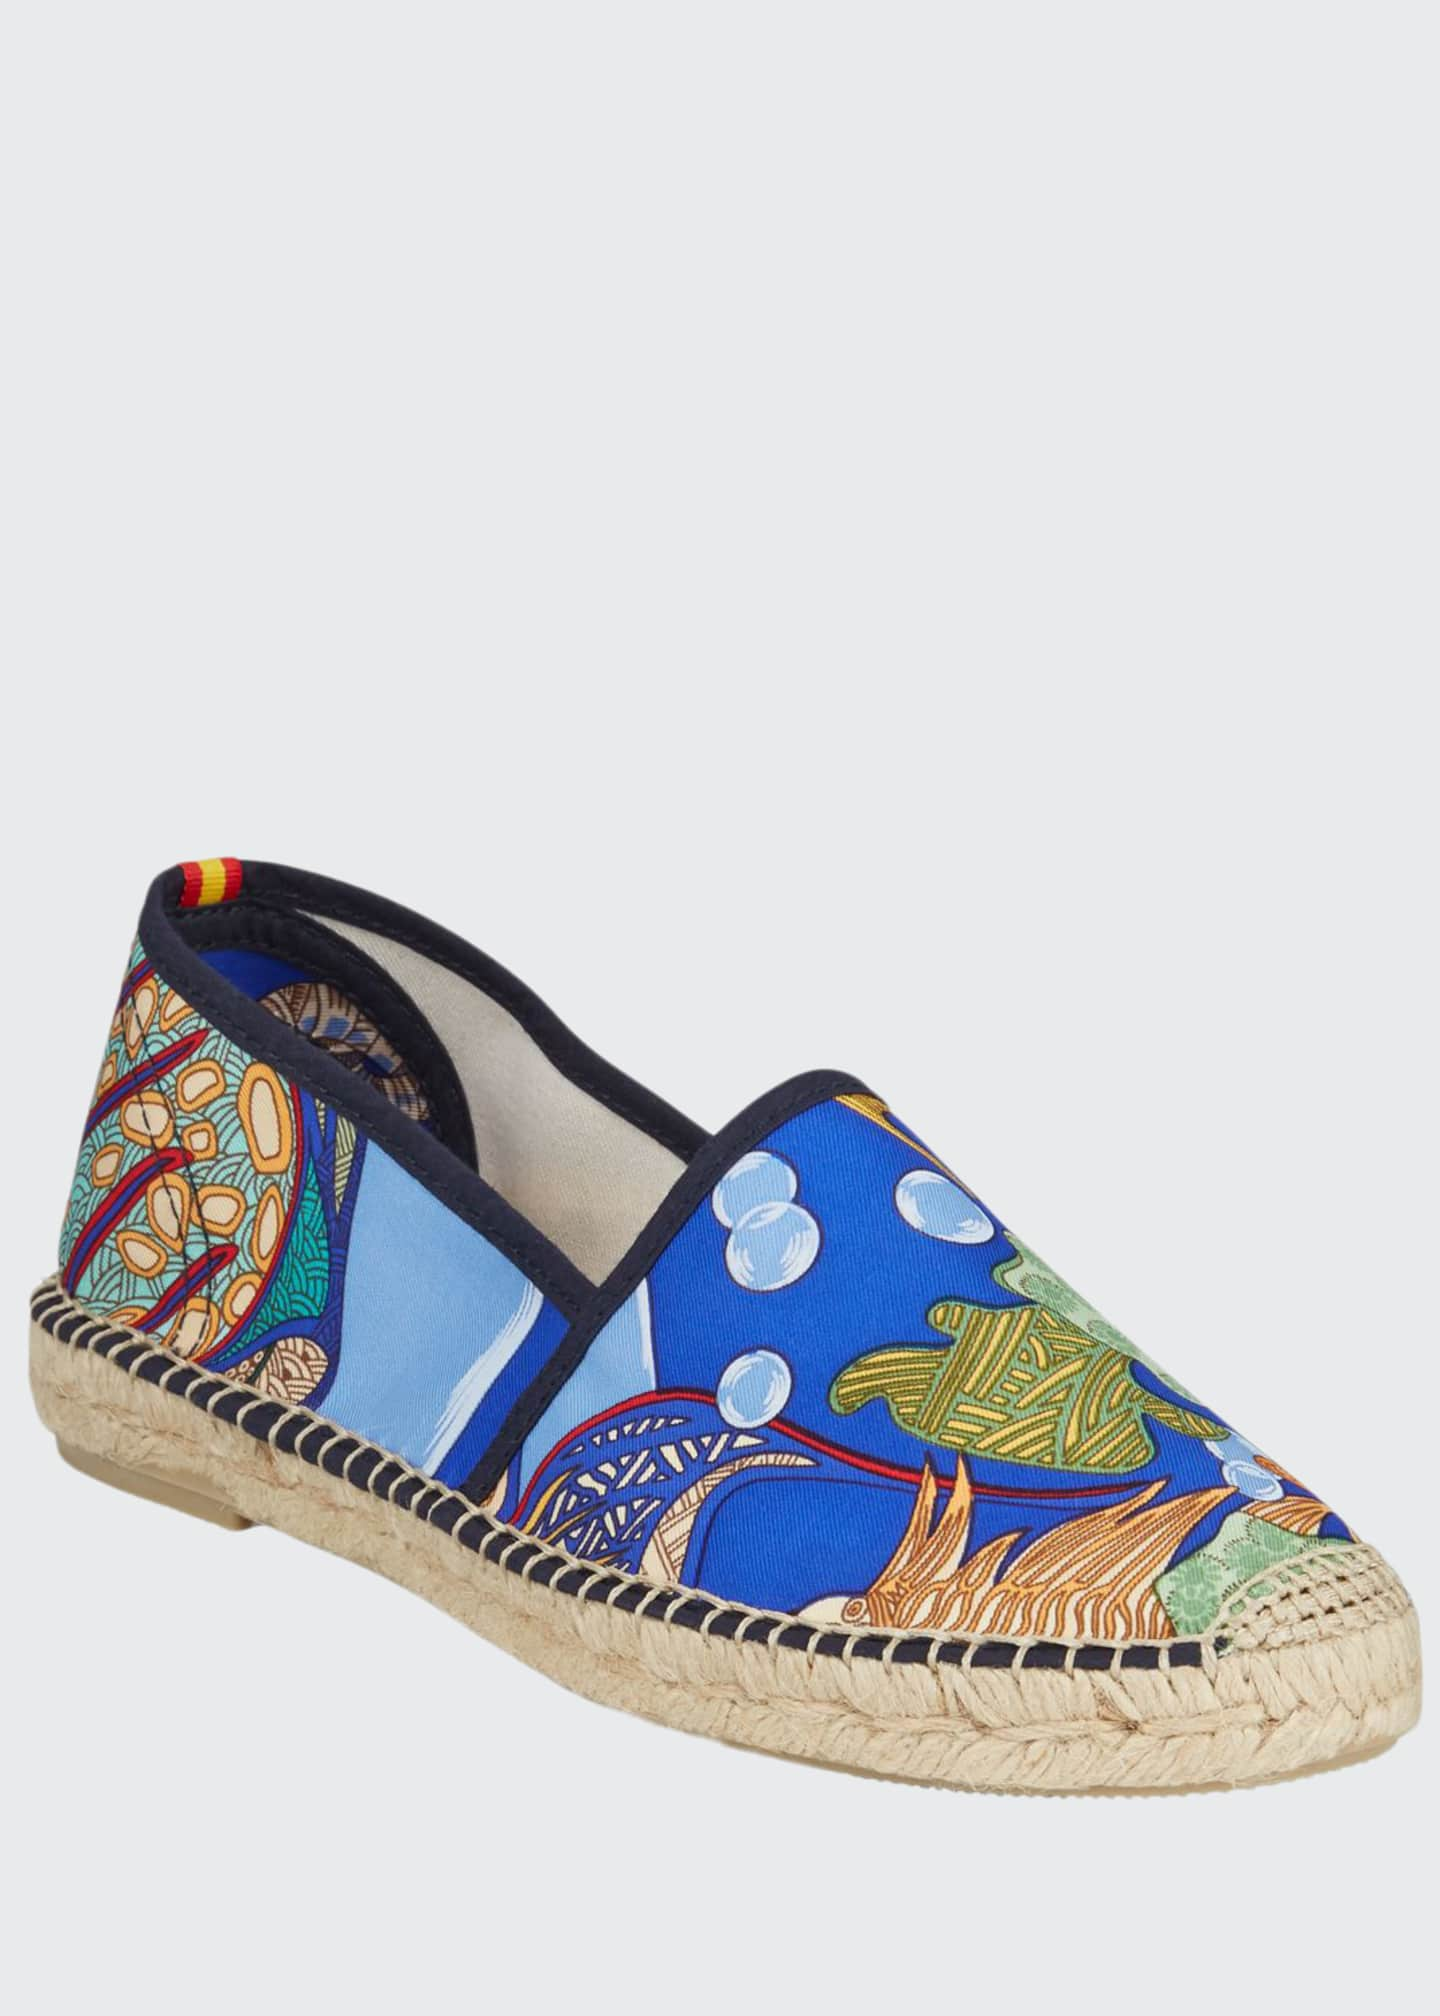 Respoke Gala Hermes Flat Silk Espadrilles